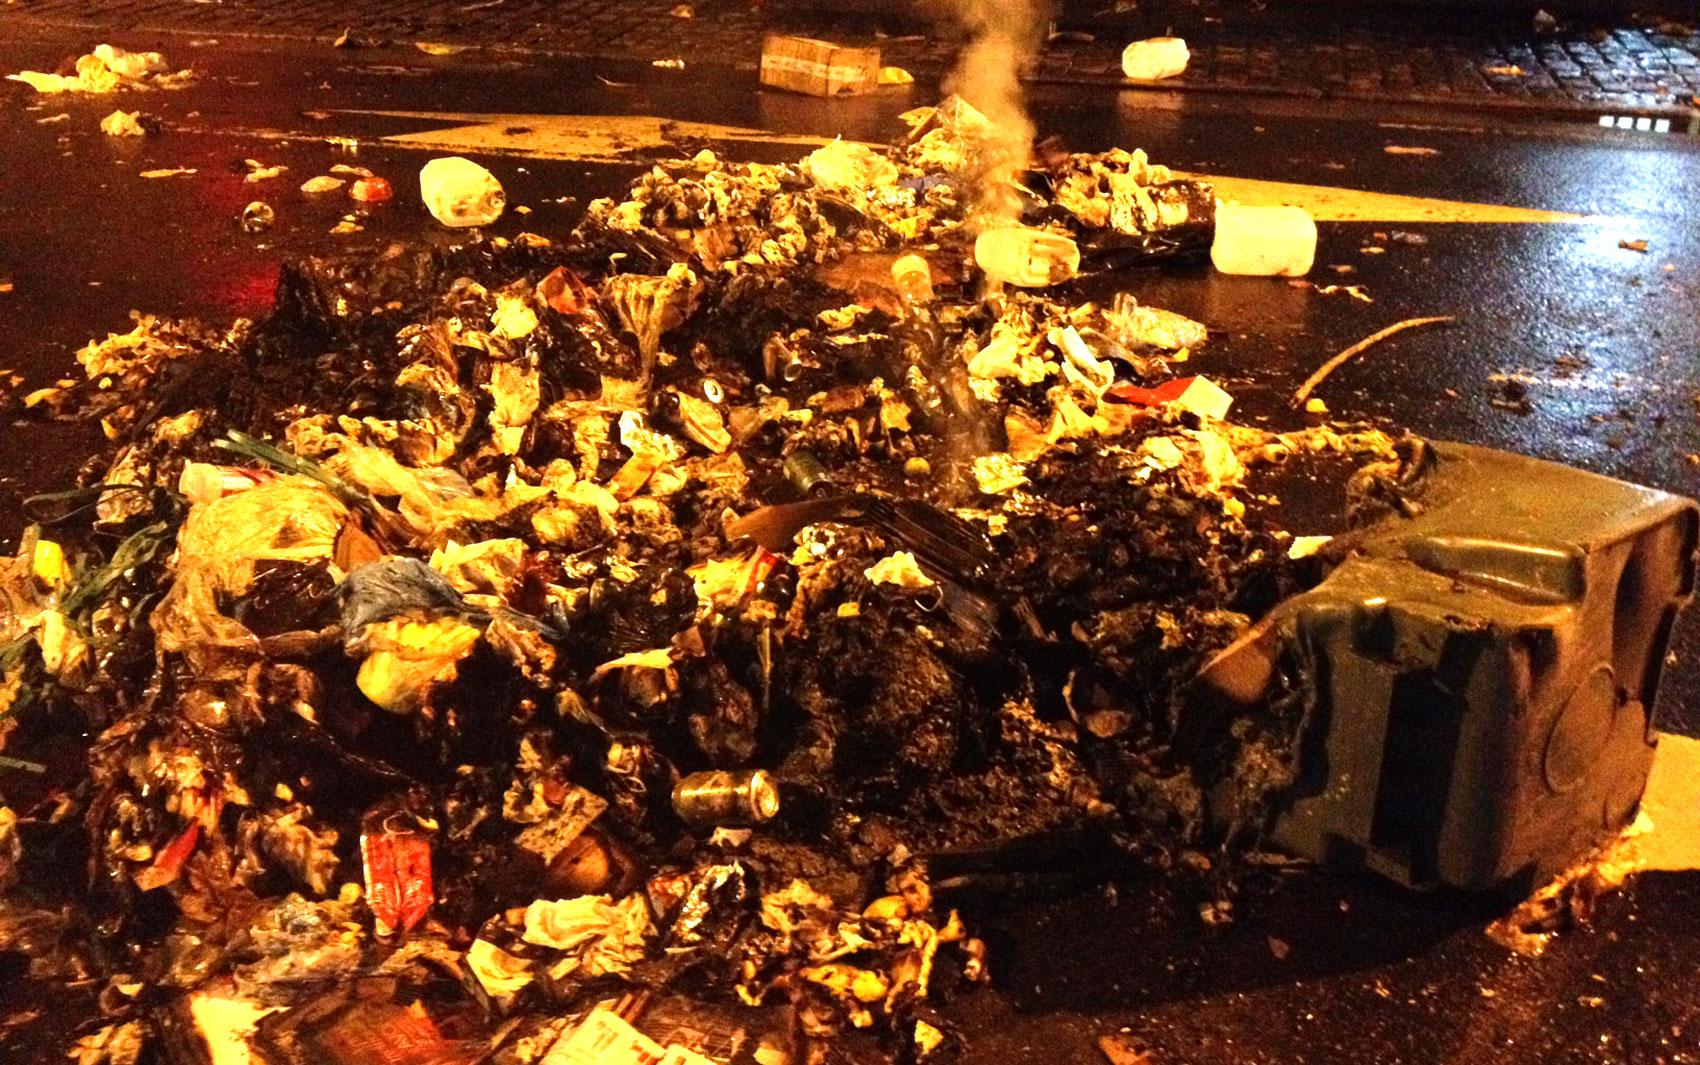 Lixo acumulado na rua Ataulfo de Paiva, no Leblon